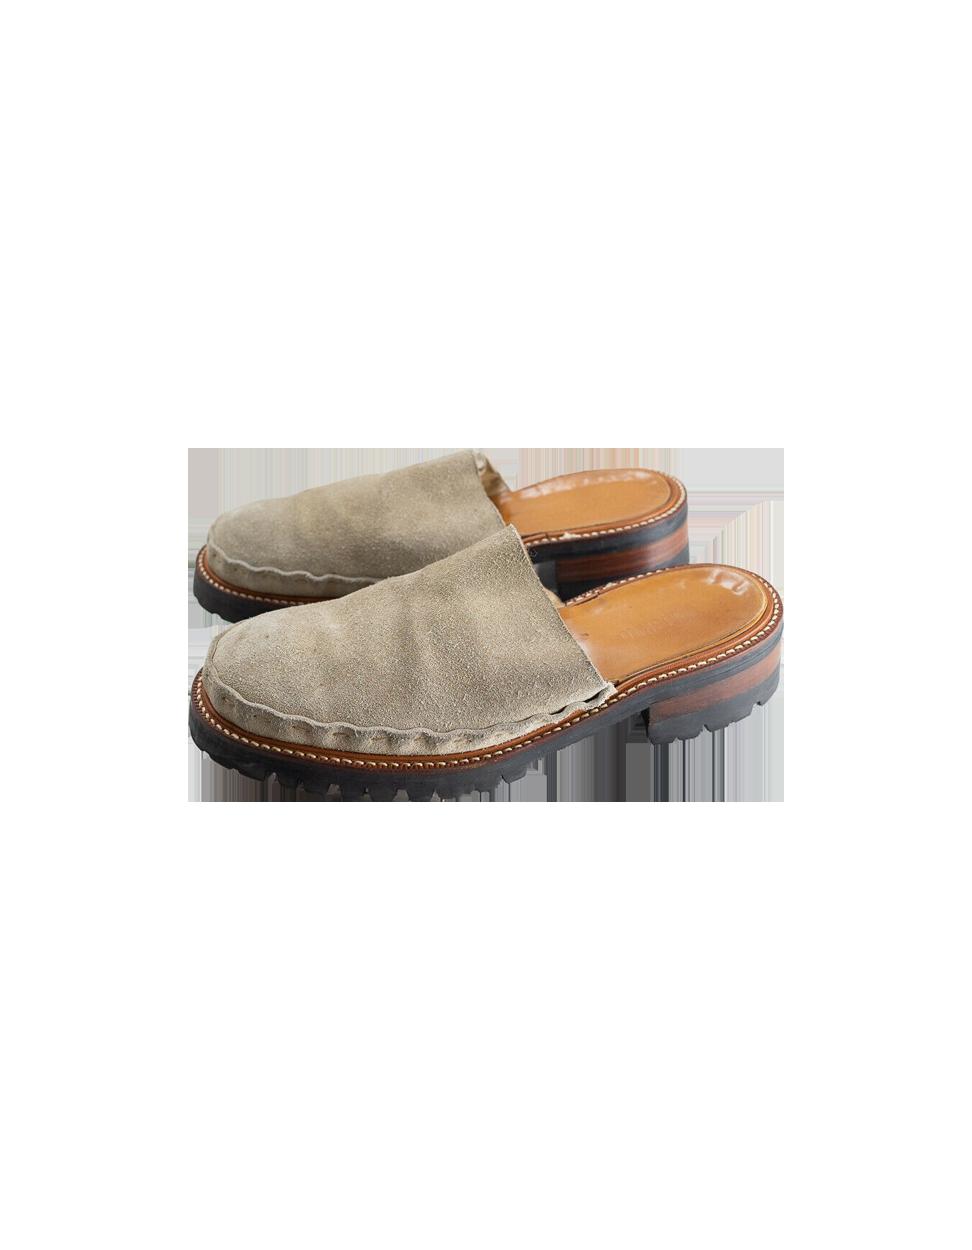 matsuda-leather-clogs-e